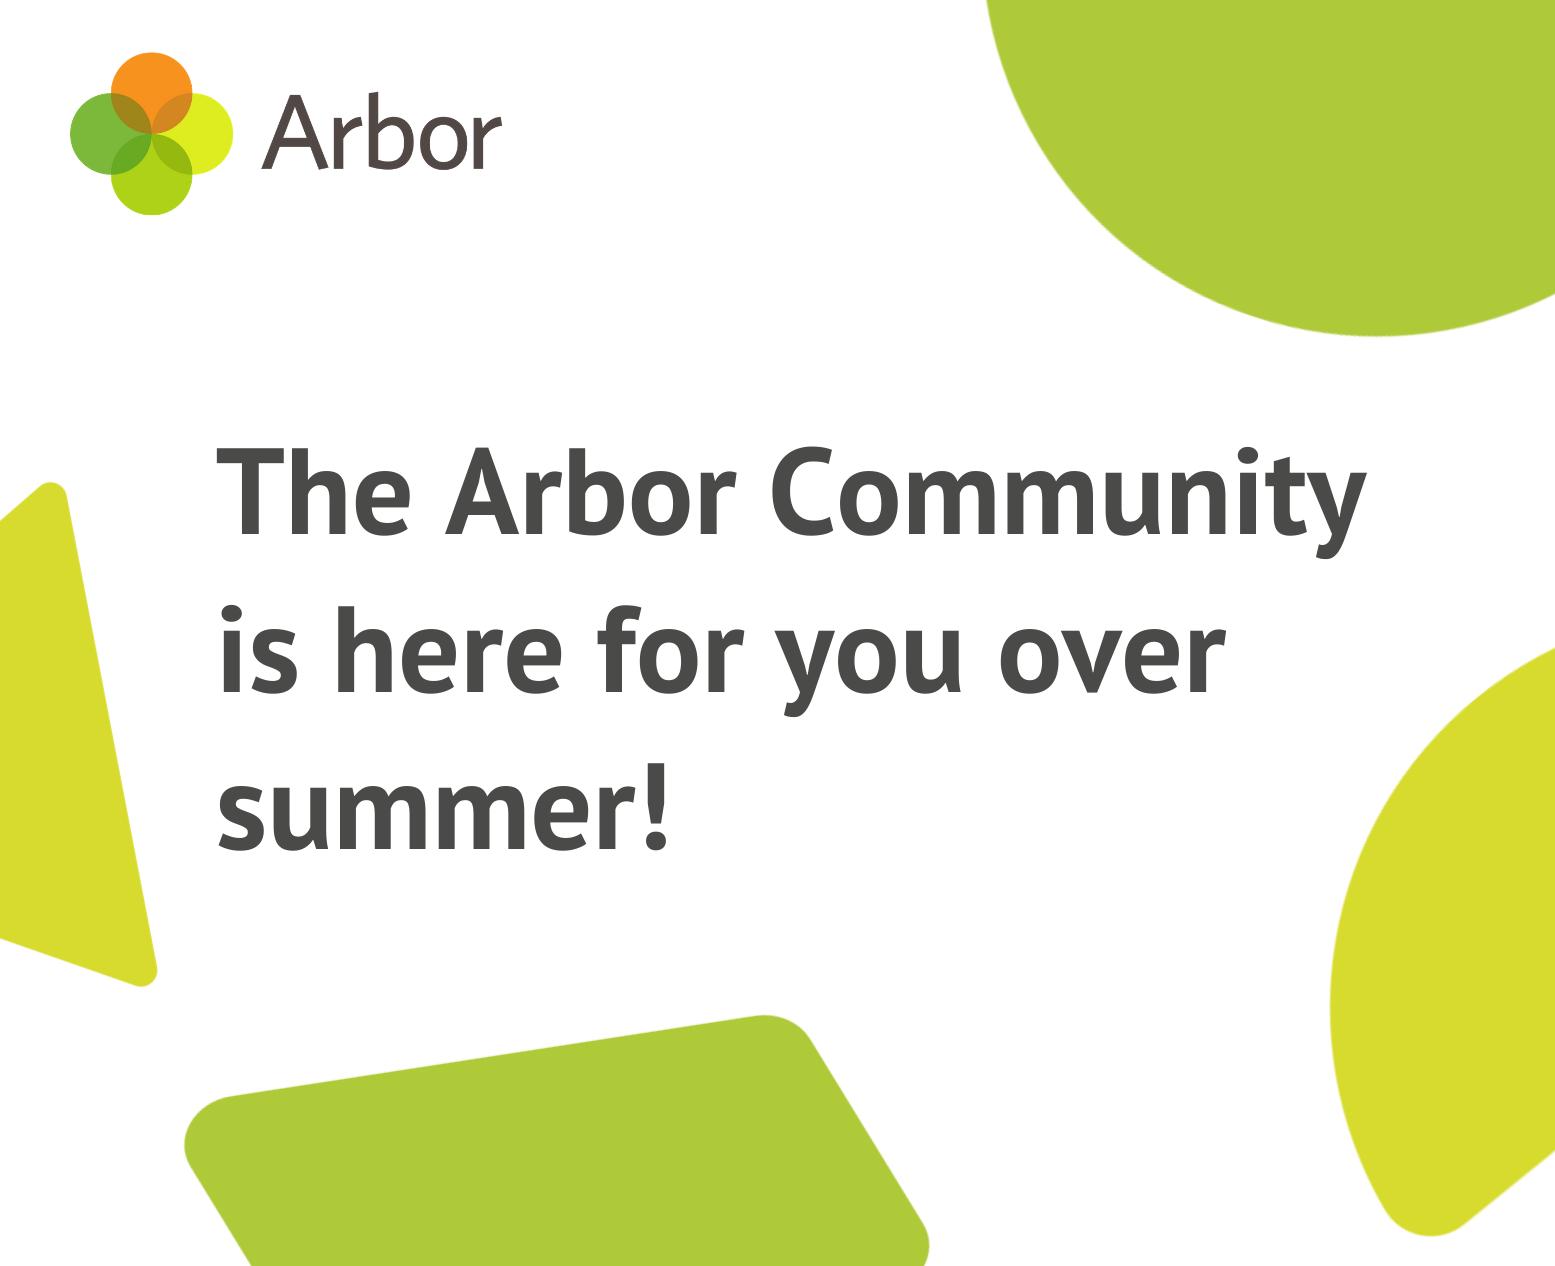 Arbor community summer